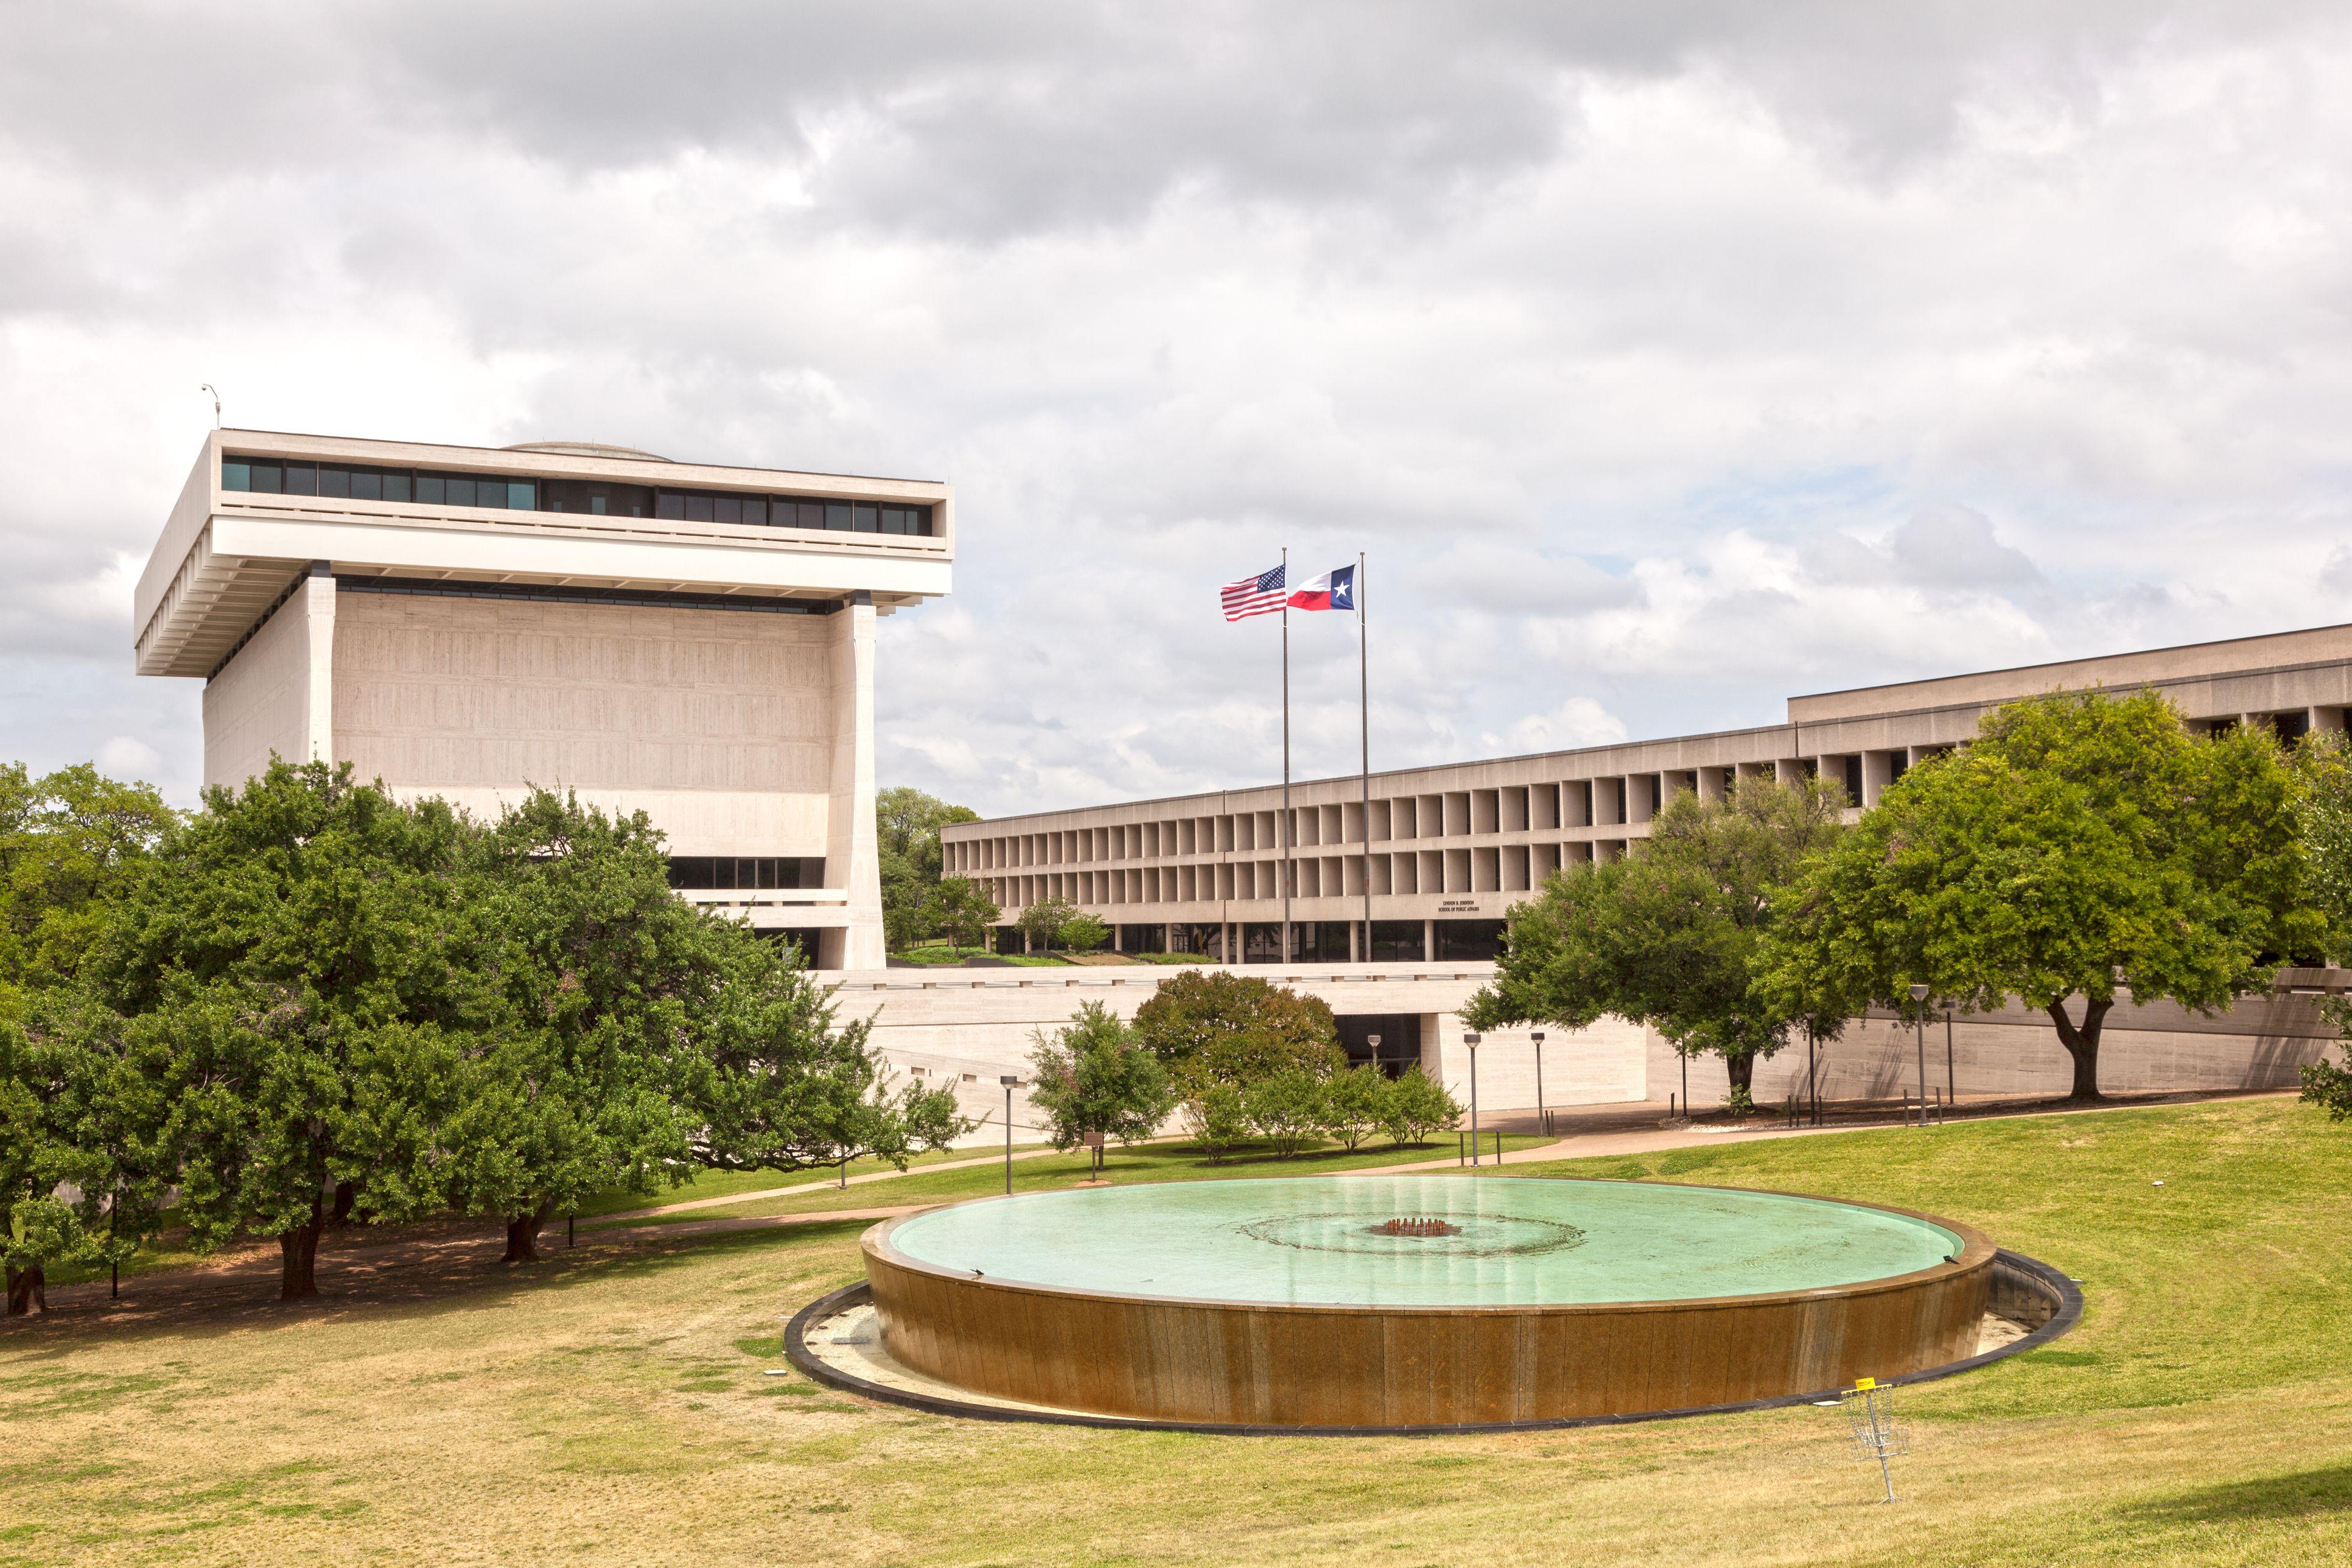 School of Public Affairs in Austin, Texas